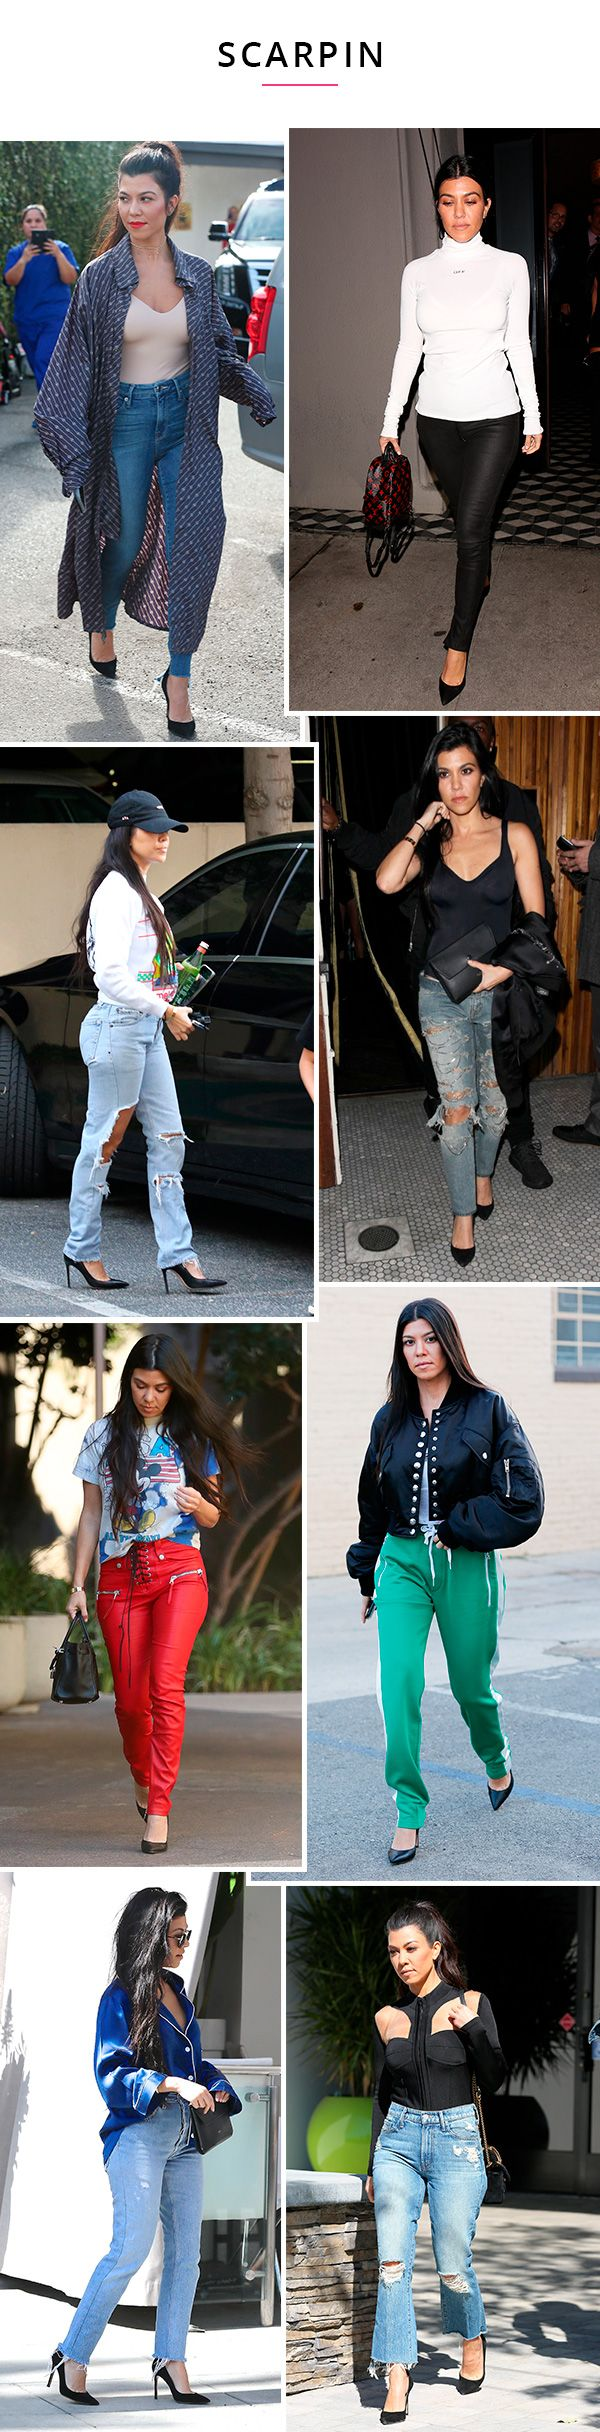 kourtney kardashian usando scarpin